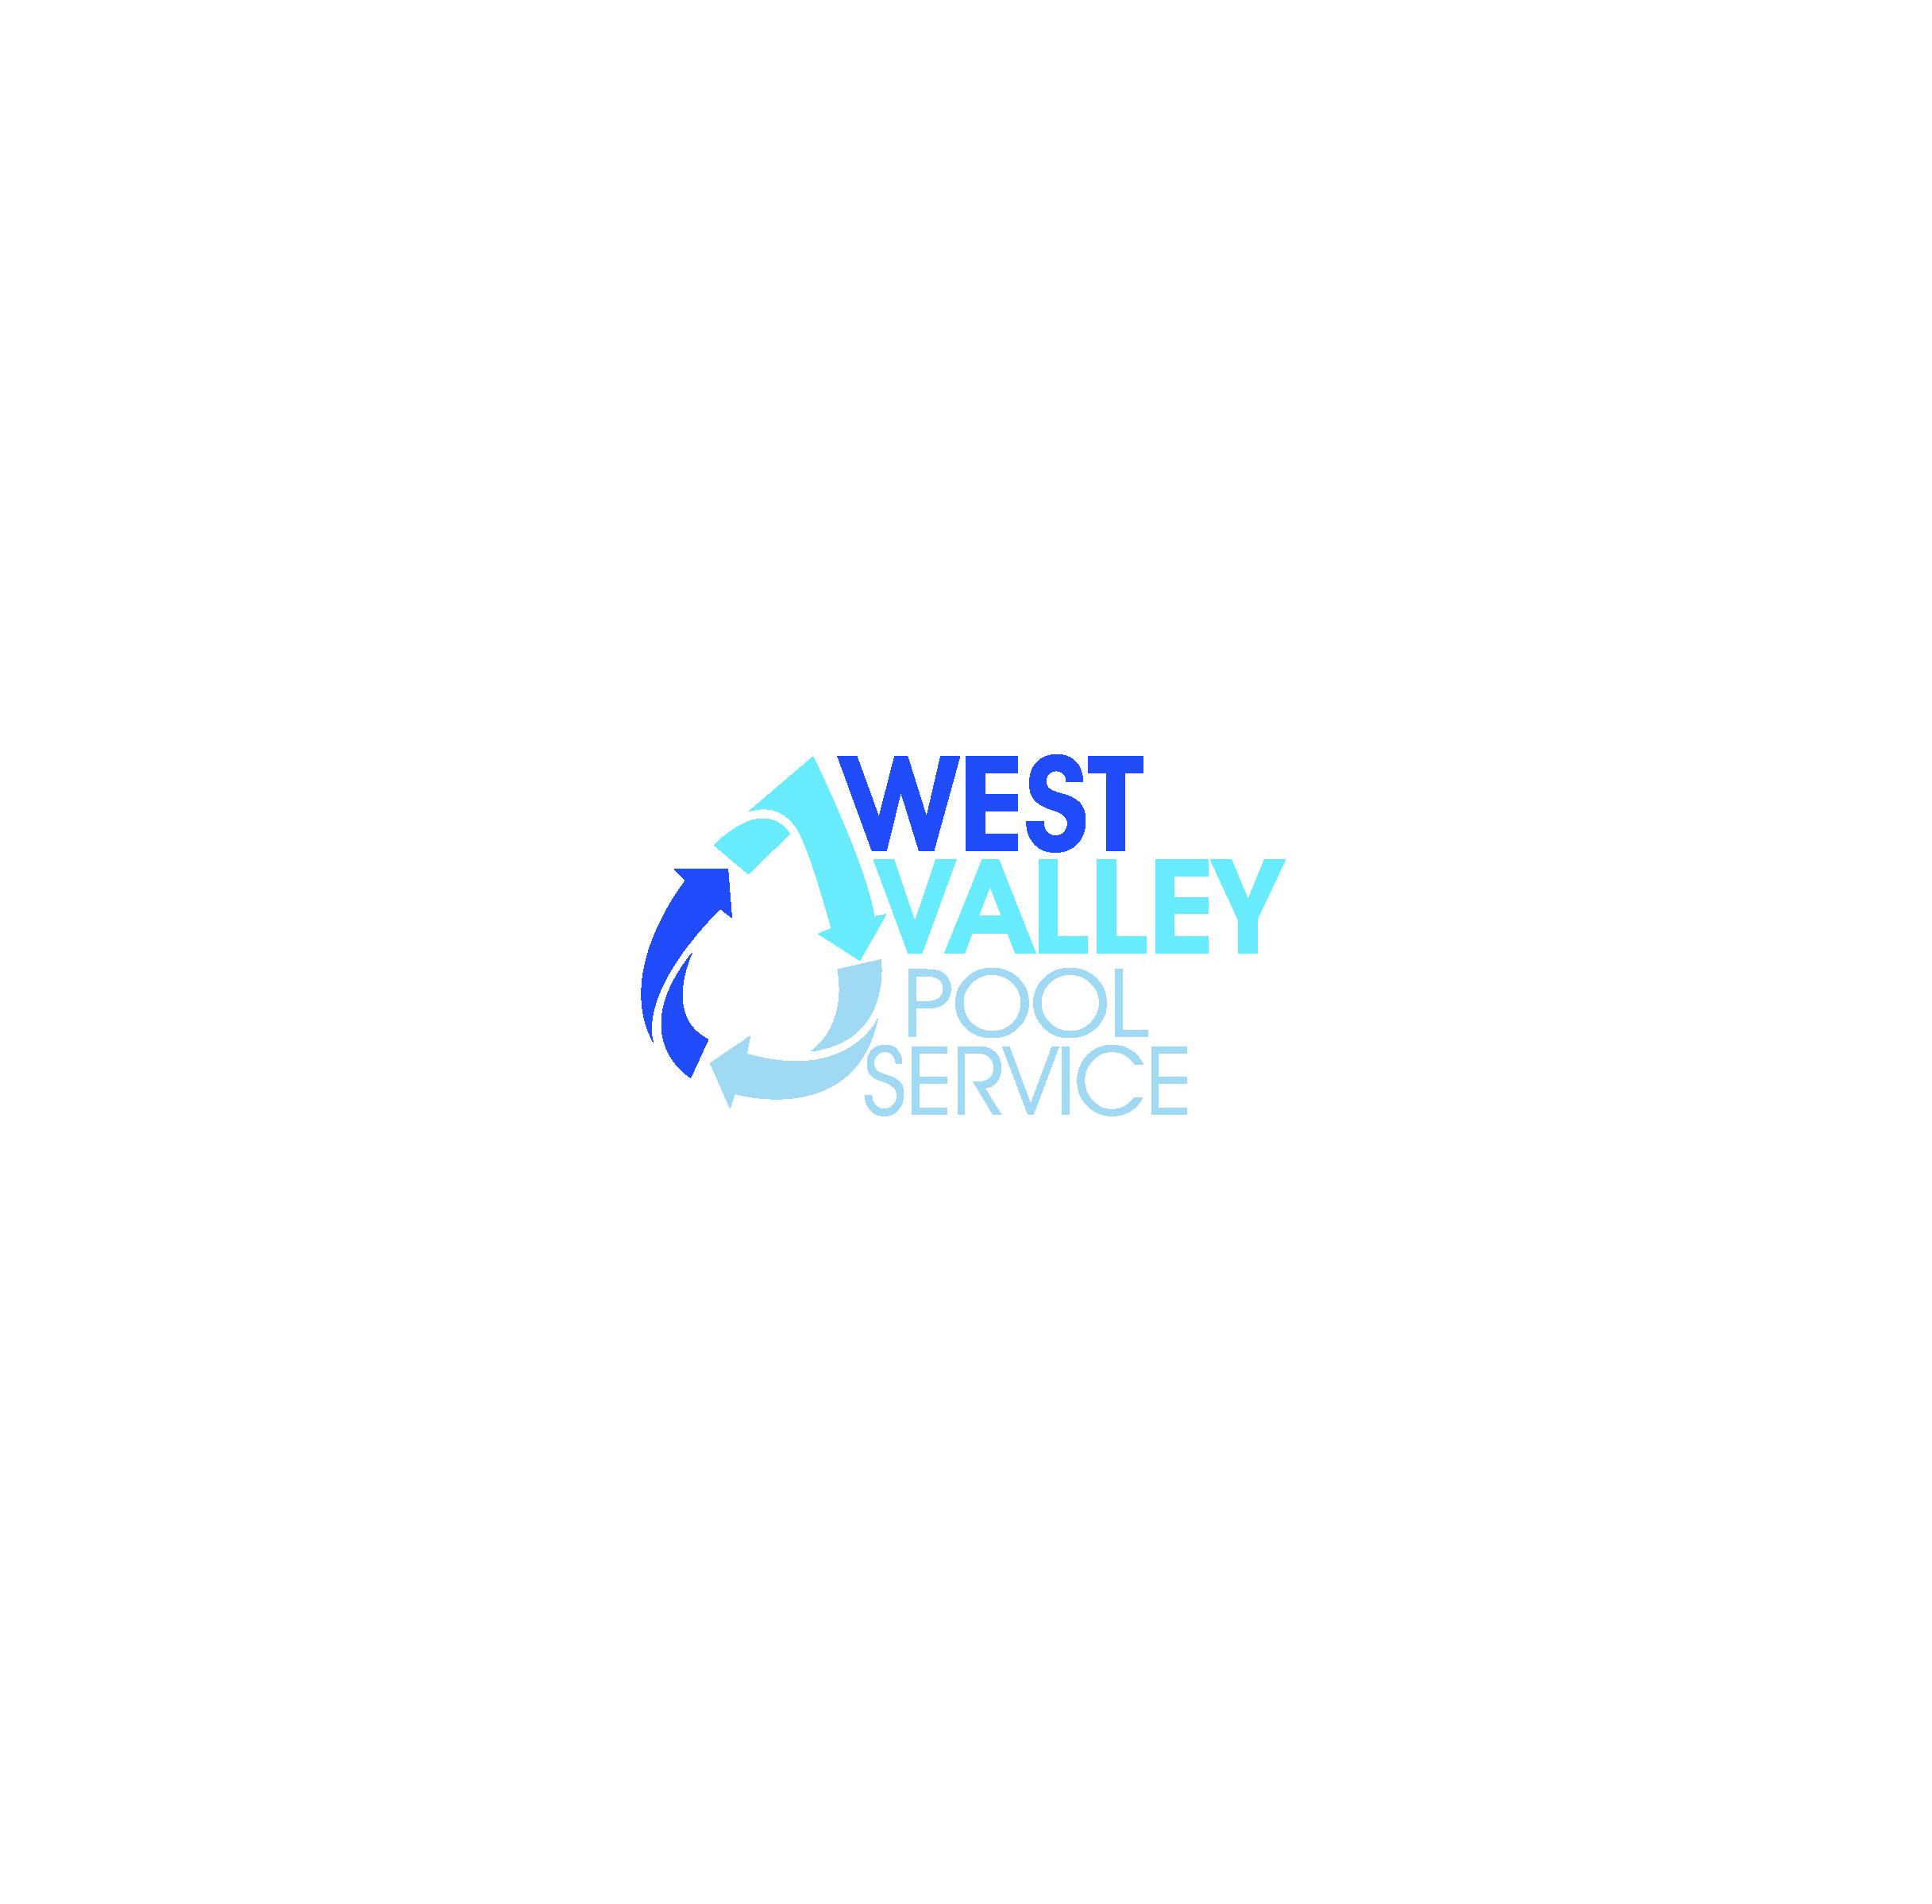 Logo Design by Sampath Gunathilaka - Entry No. 96 in the Logo Design Contest Clever Logo Design for West Valley Pool Service.